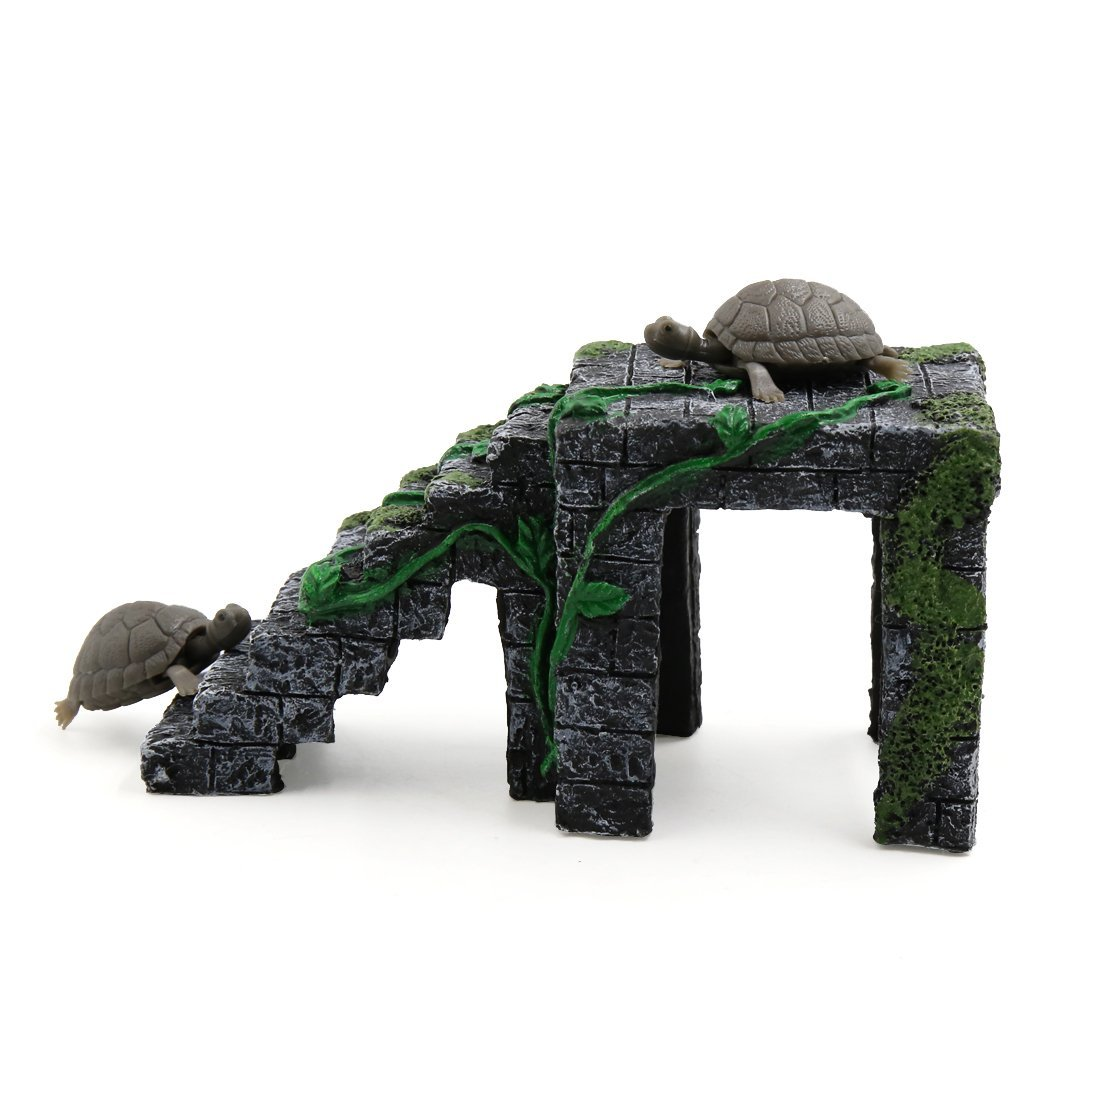 Amazon.com : eDealMax Gris Oscuro acuario Verde paisaje Resina Basking Rampa Tortuga Suba Piedra Hábitat ornamento : Pet Supplies